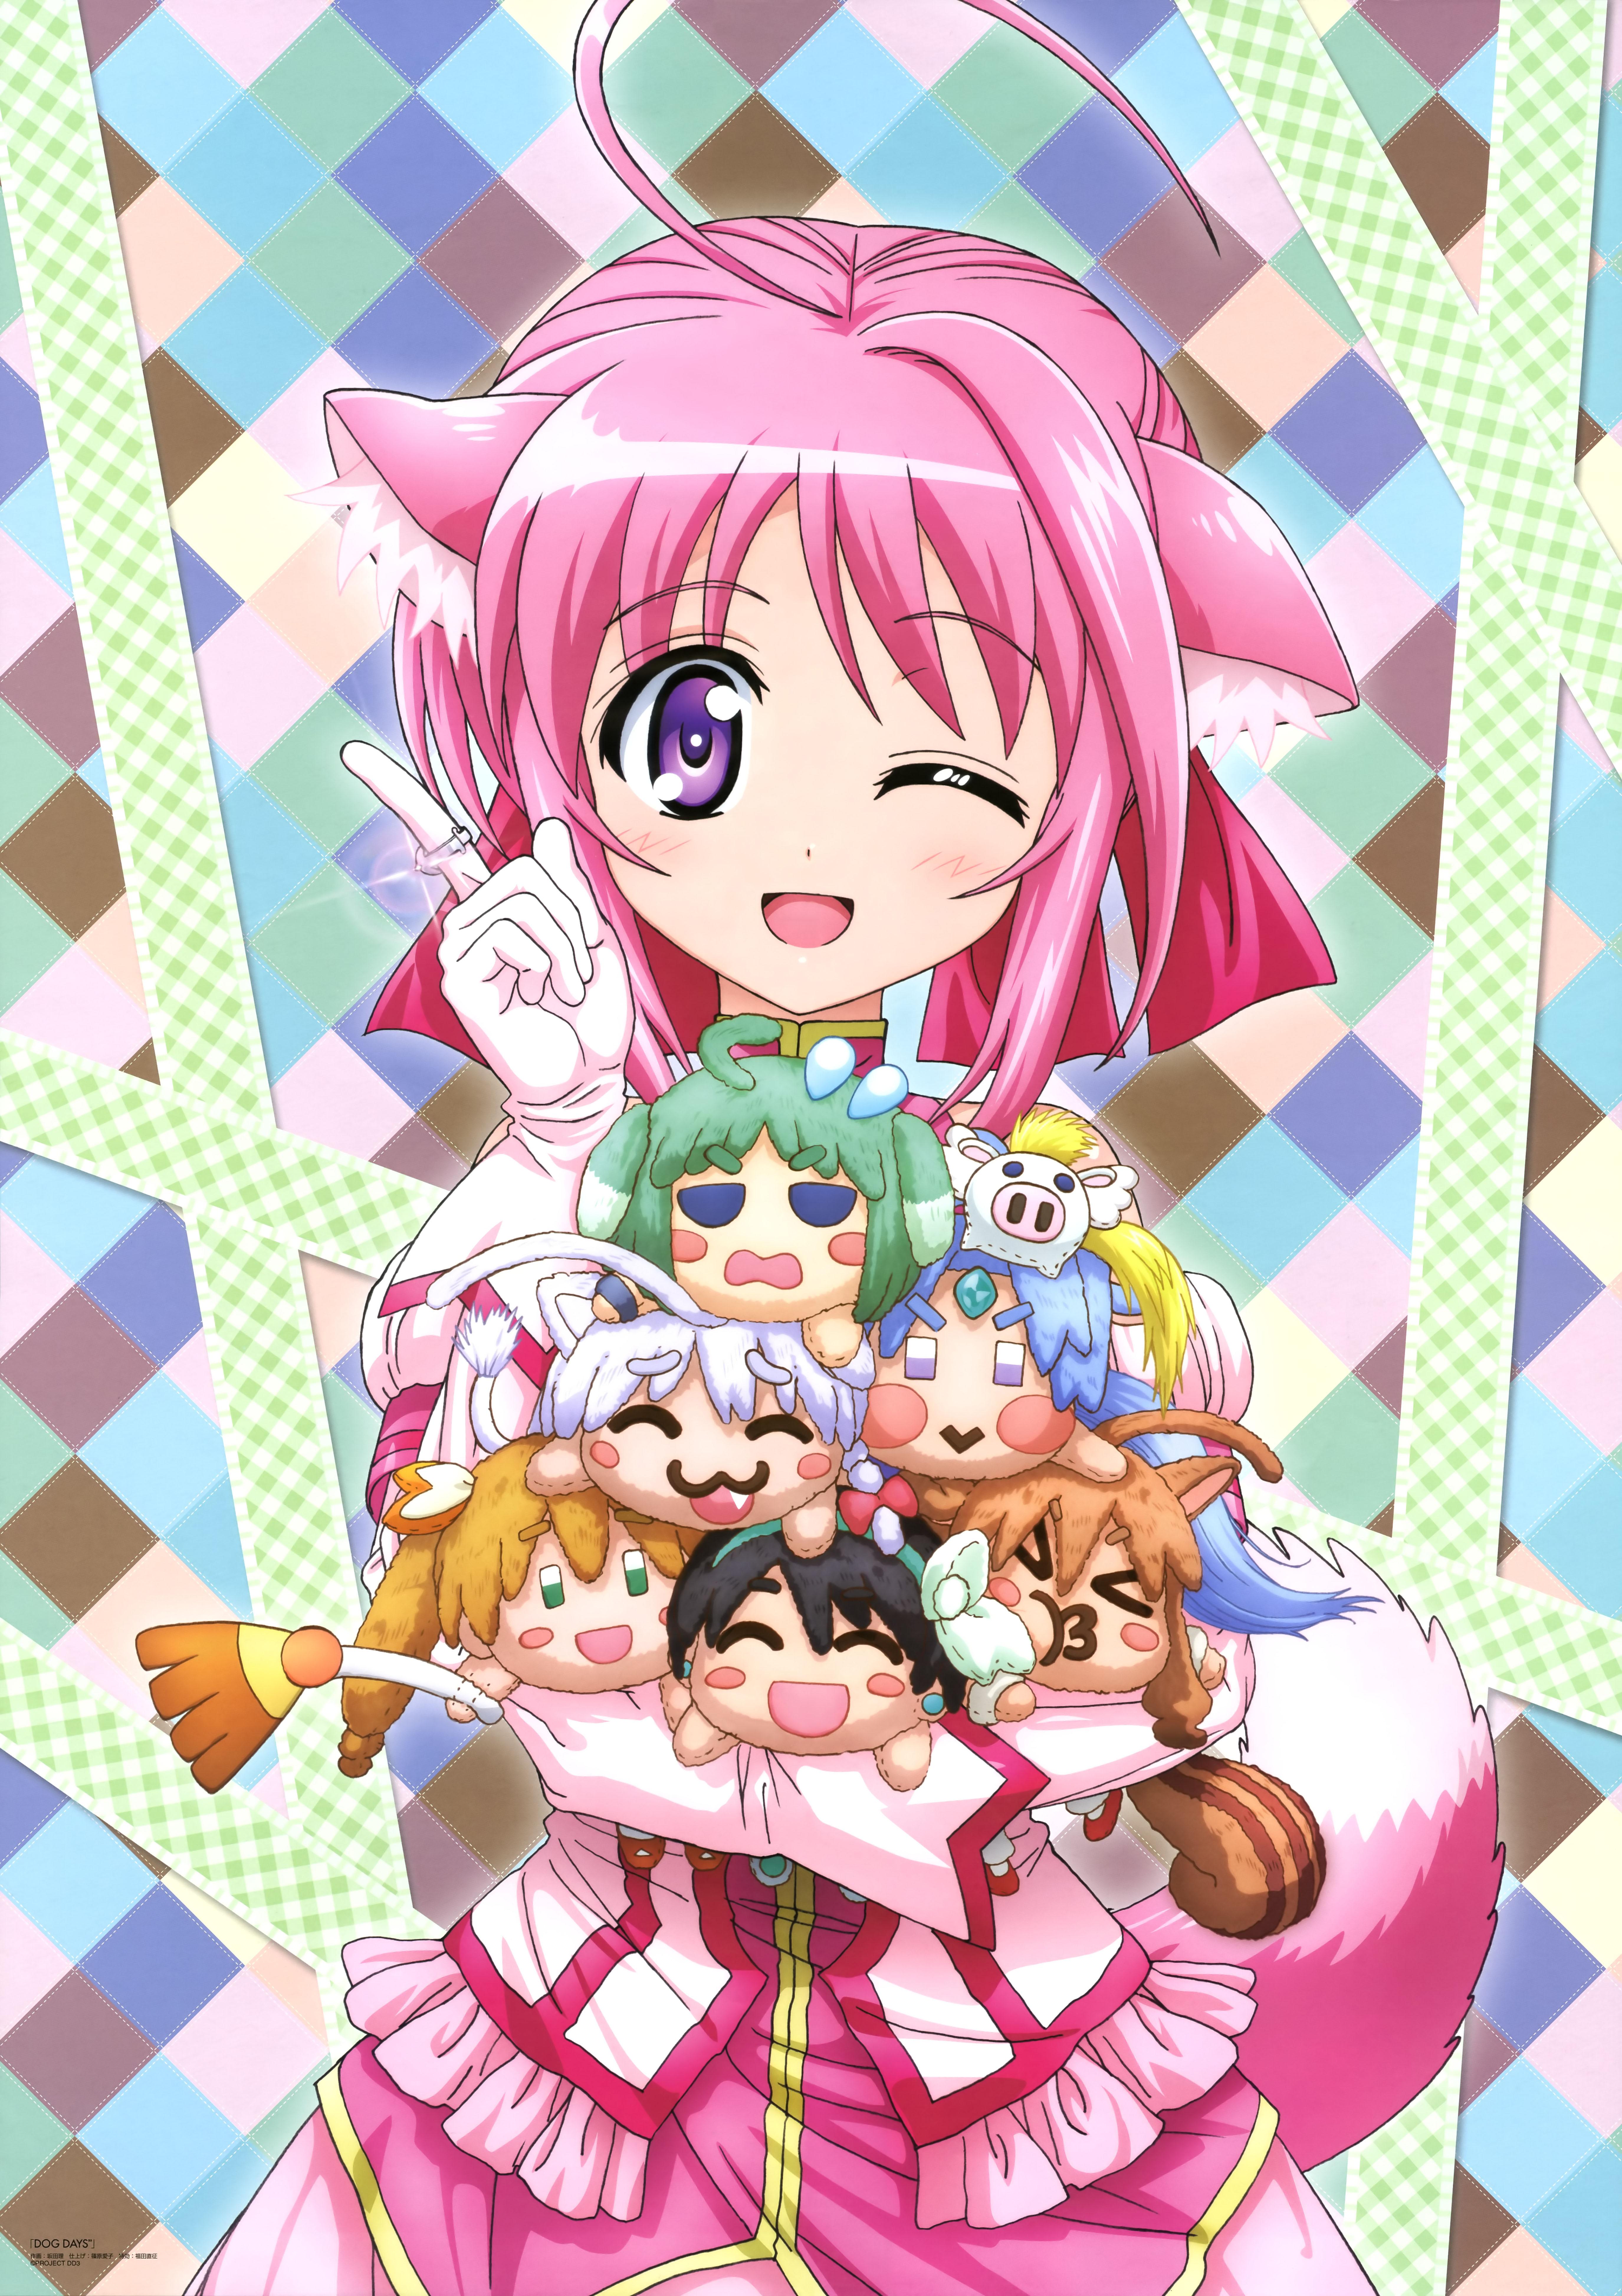 NyanType Magazine April 2015 anime posters Haruhichan.com Dog Days